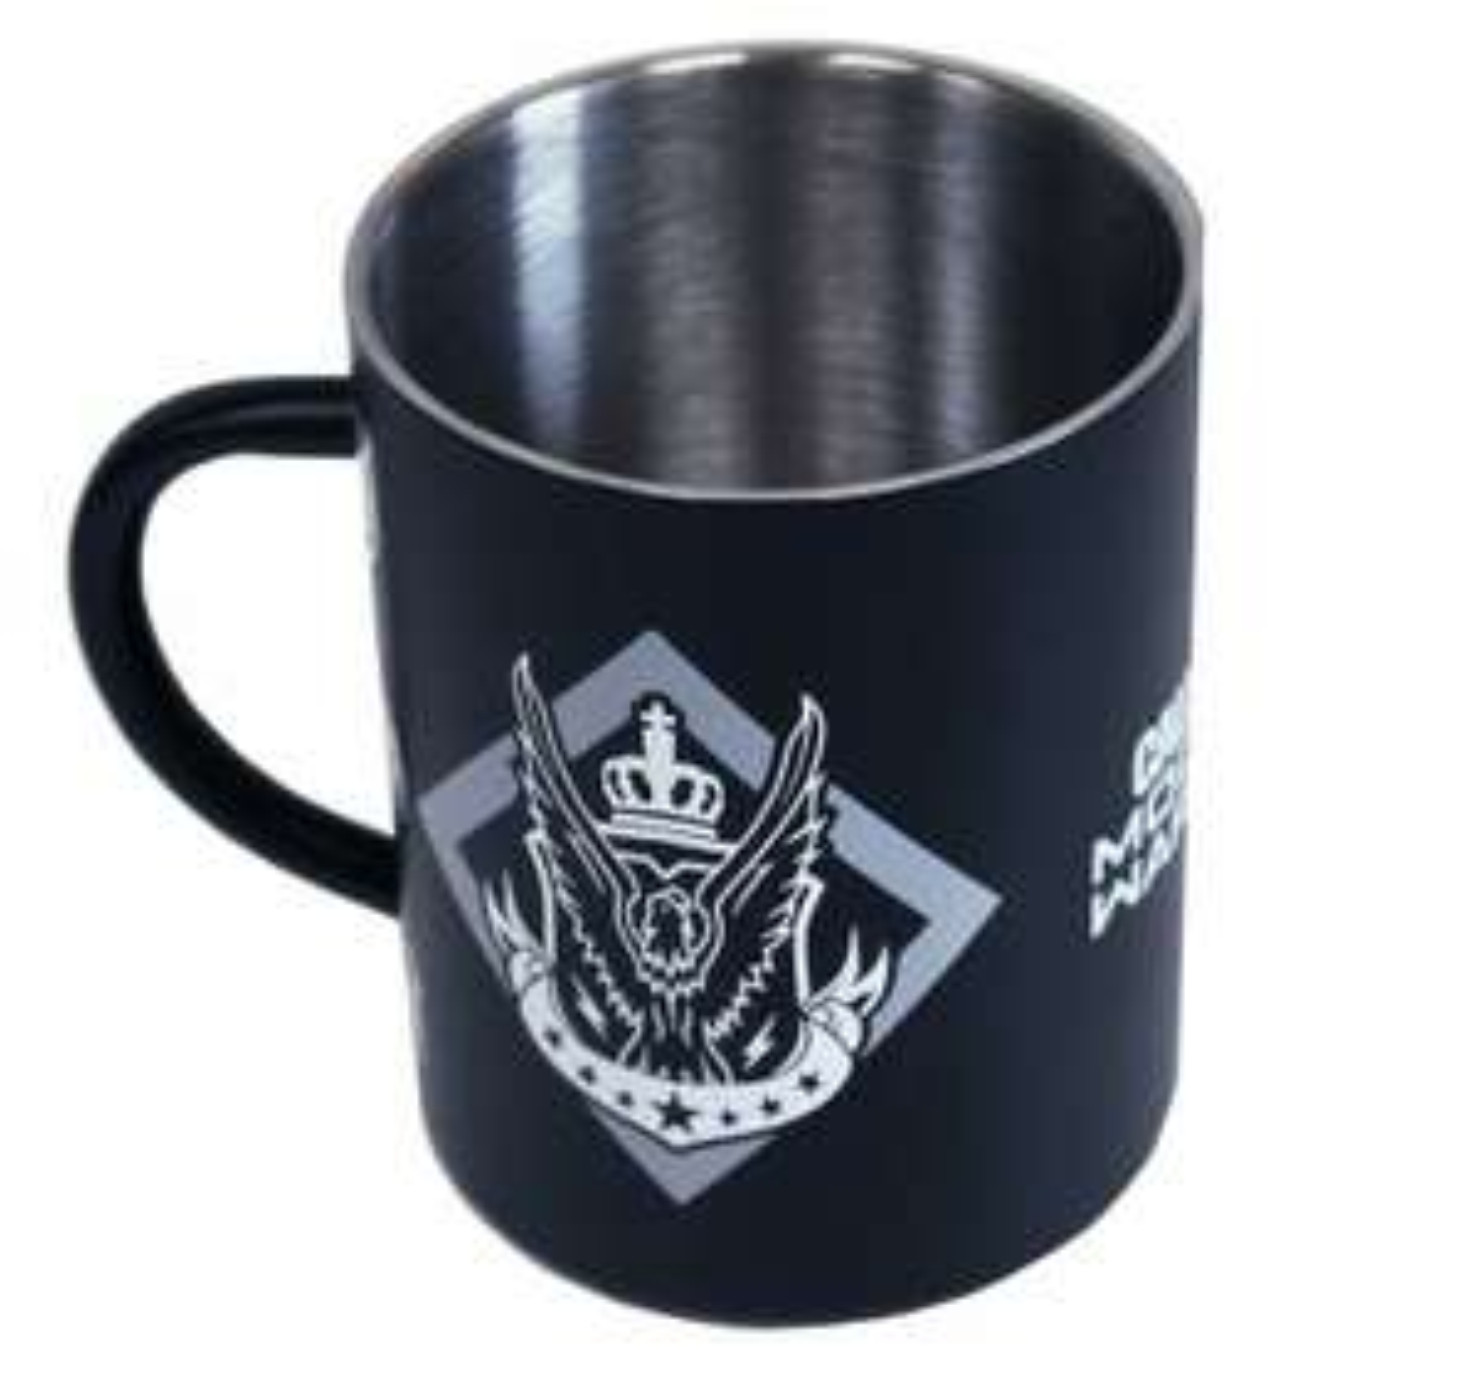 Official Call of Duty Modern Warfare Steel Mug - £3.99 Delivered @ Argos via eBay